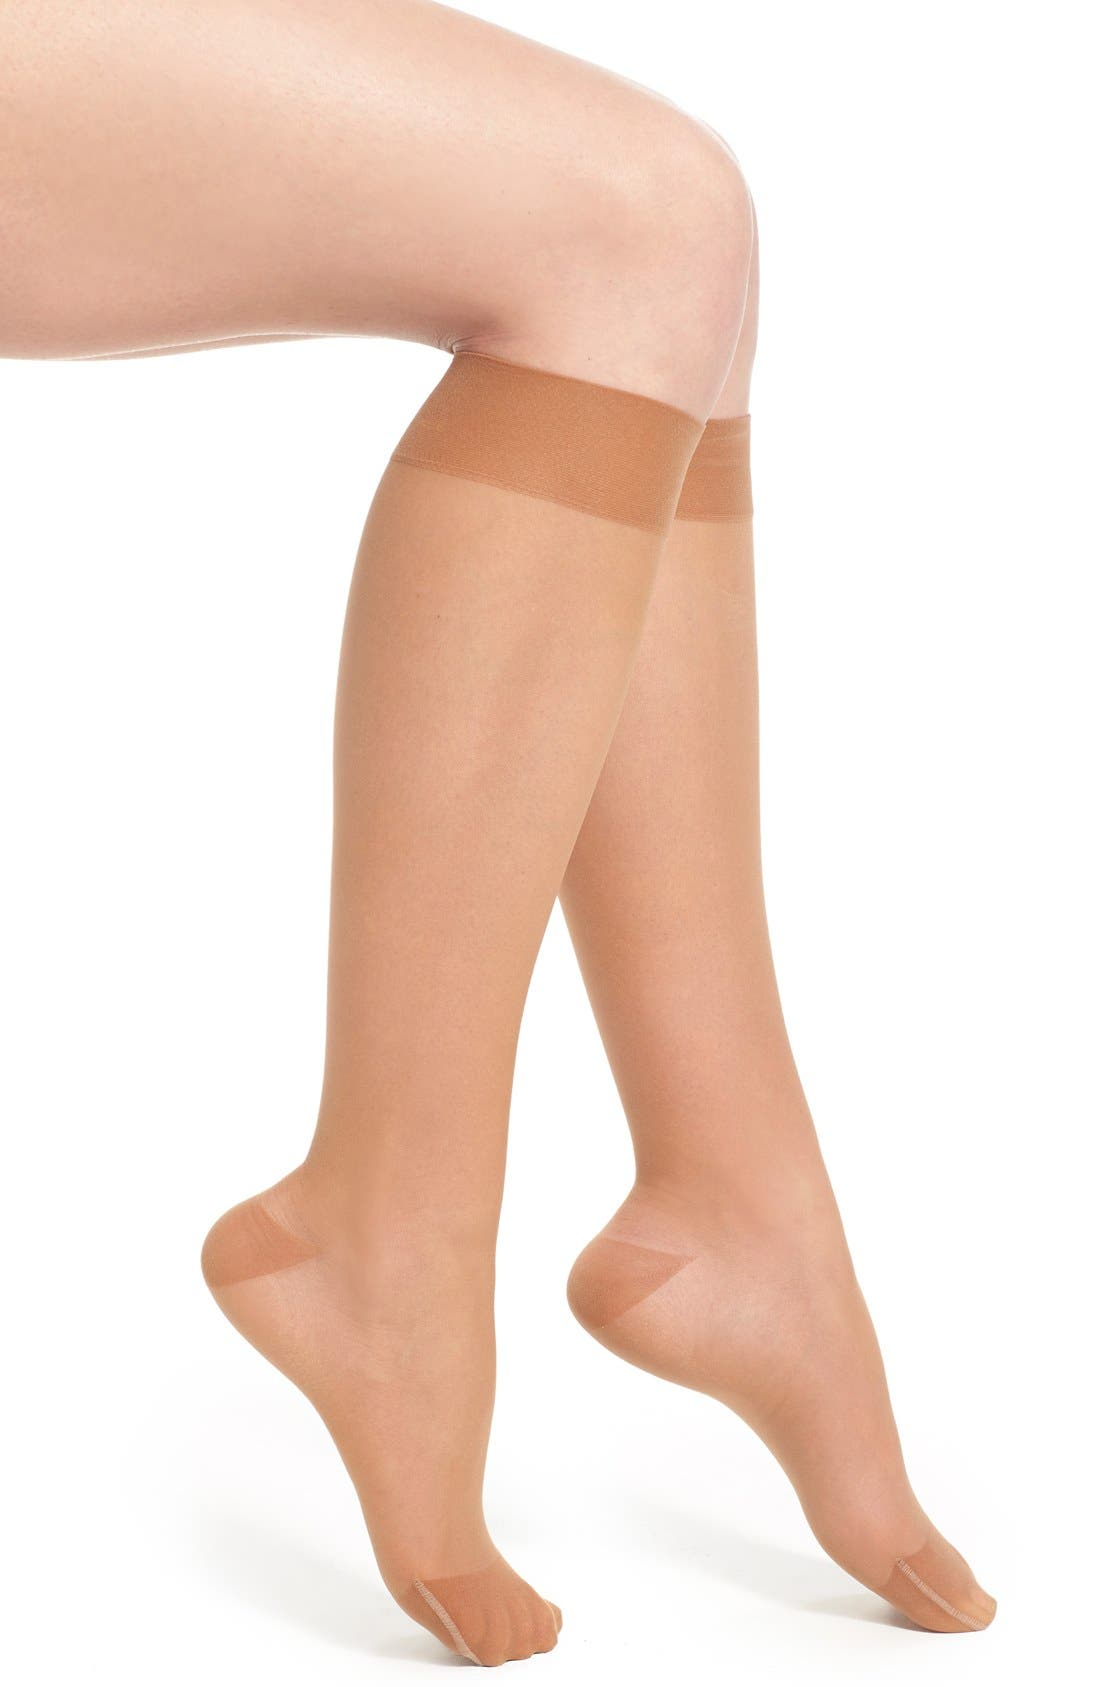 Sheer Compression Knee High Socks,                             Main thumbnail 1, color,                             Sun